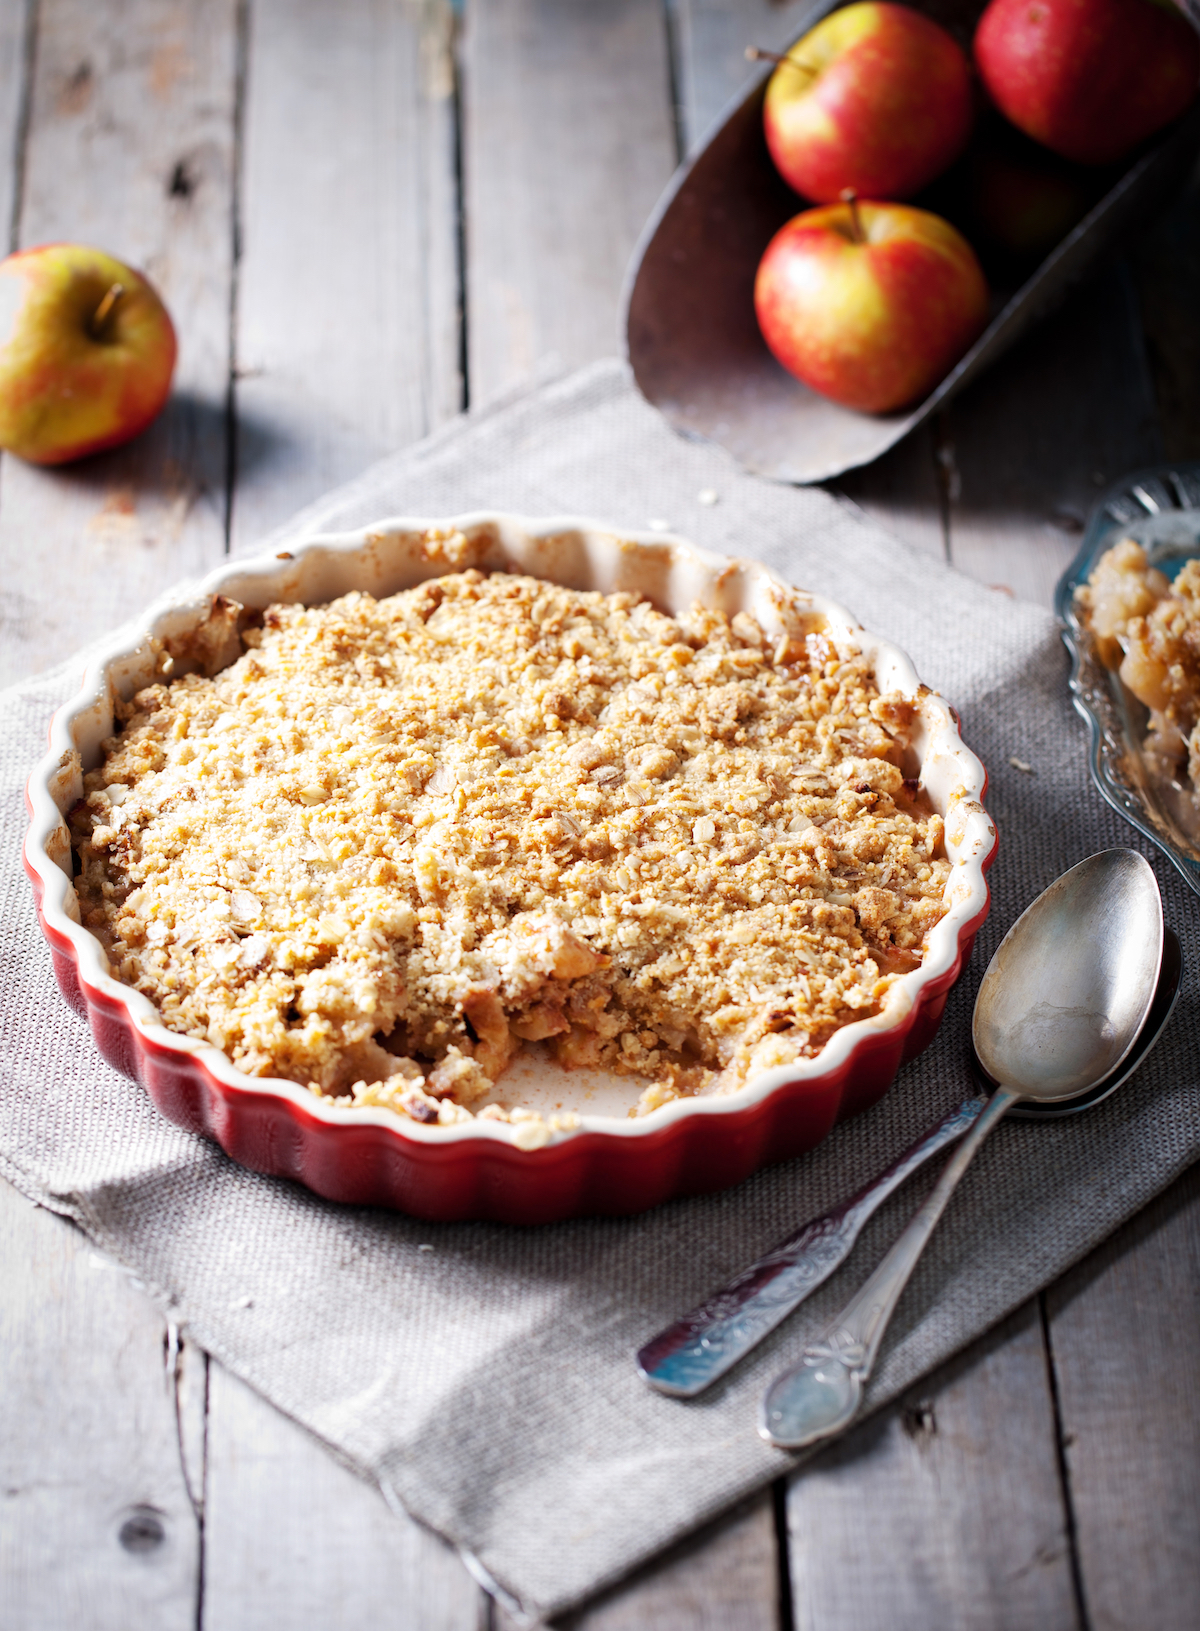 Crumble aux pommes © Anna_Pustynniko shutterstock